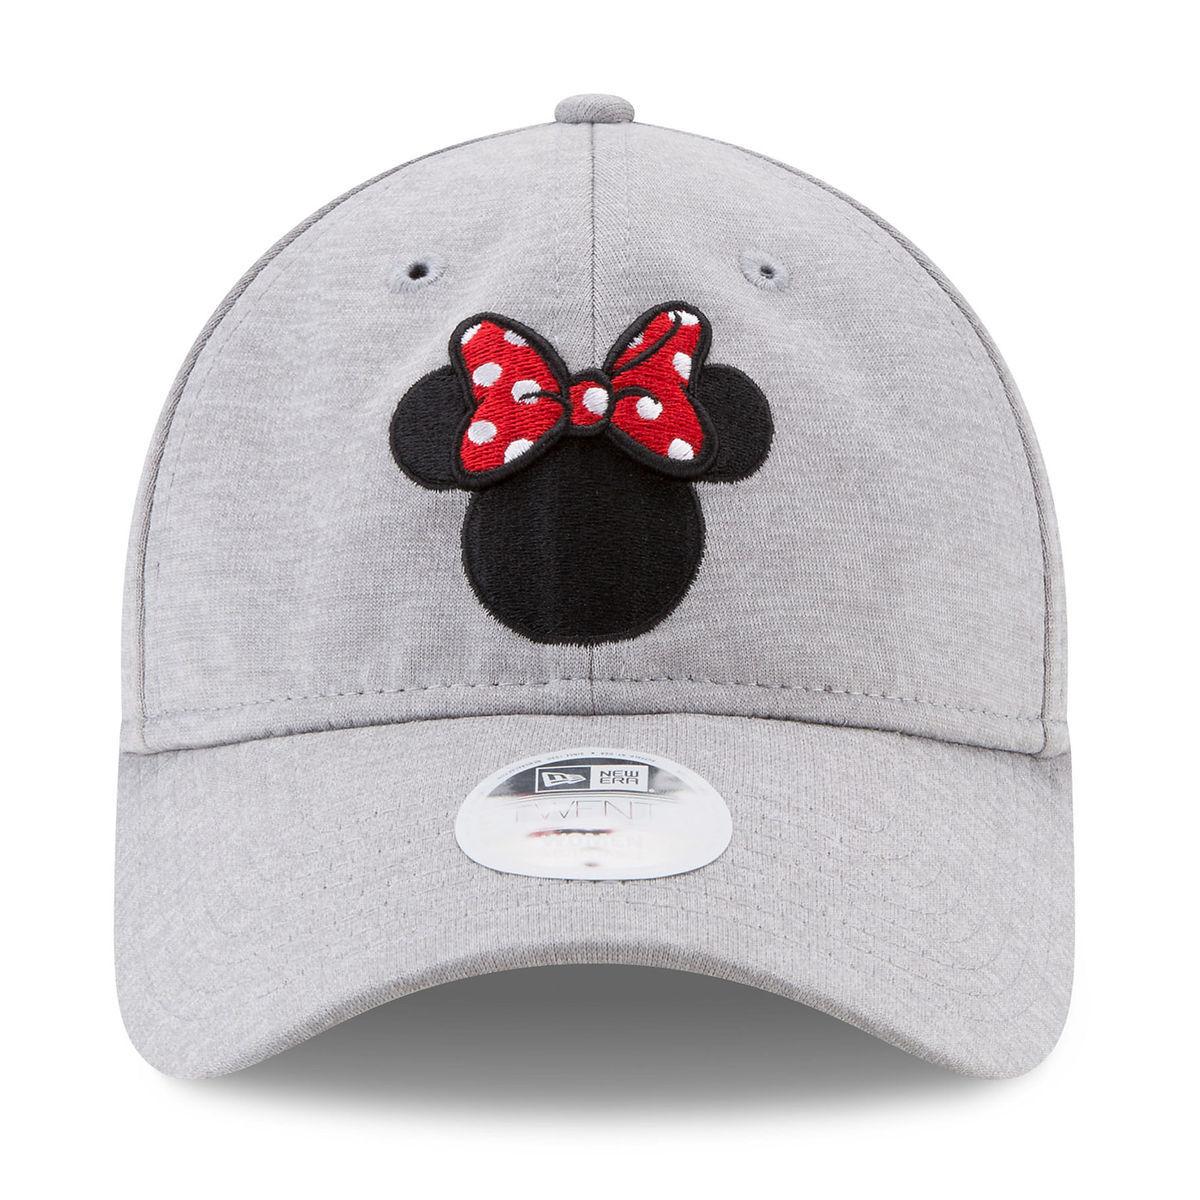 3b43ce51ea4 Product Image of Minnie Mouse Baseball Cap - New Era - Adults   1